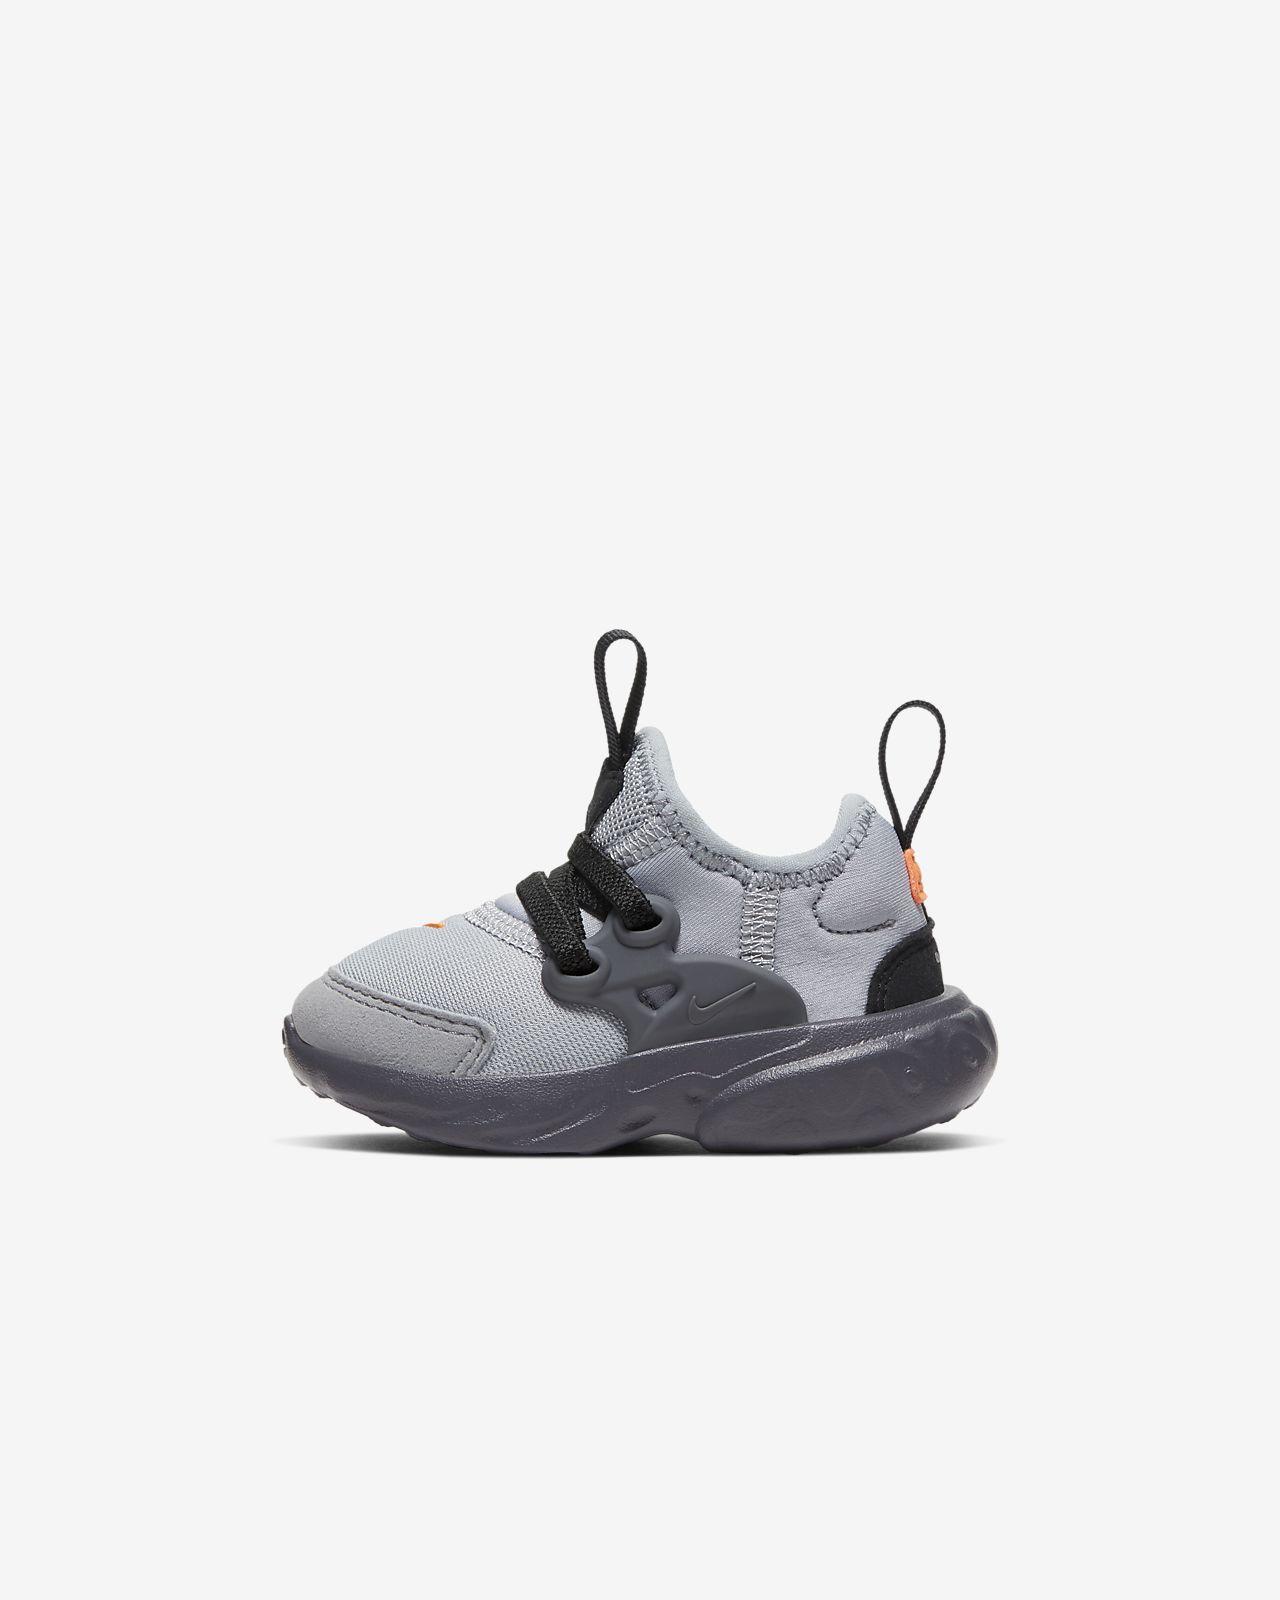 Nike RT Presto sko til babyersmåbørn